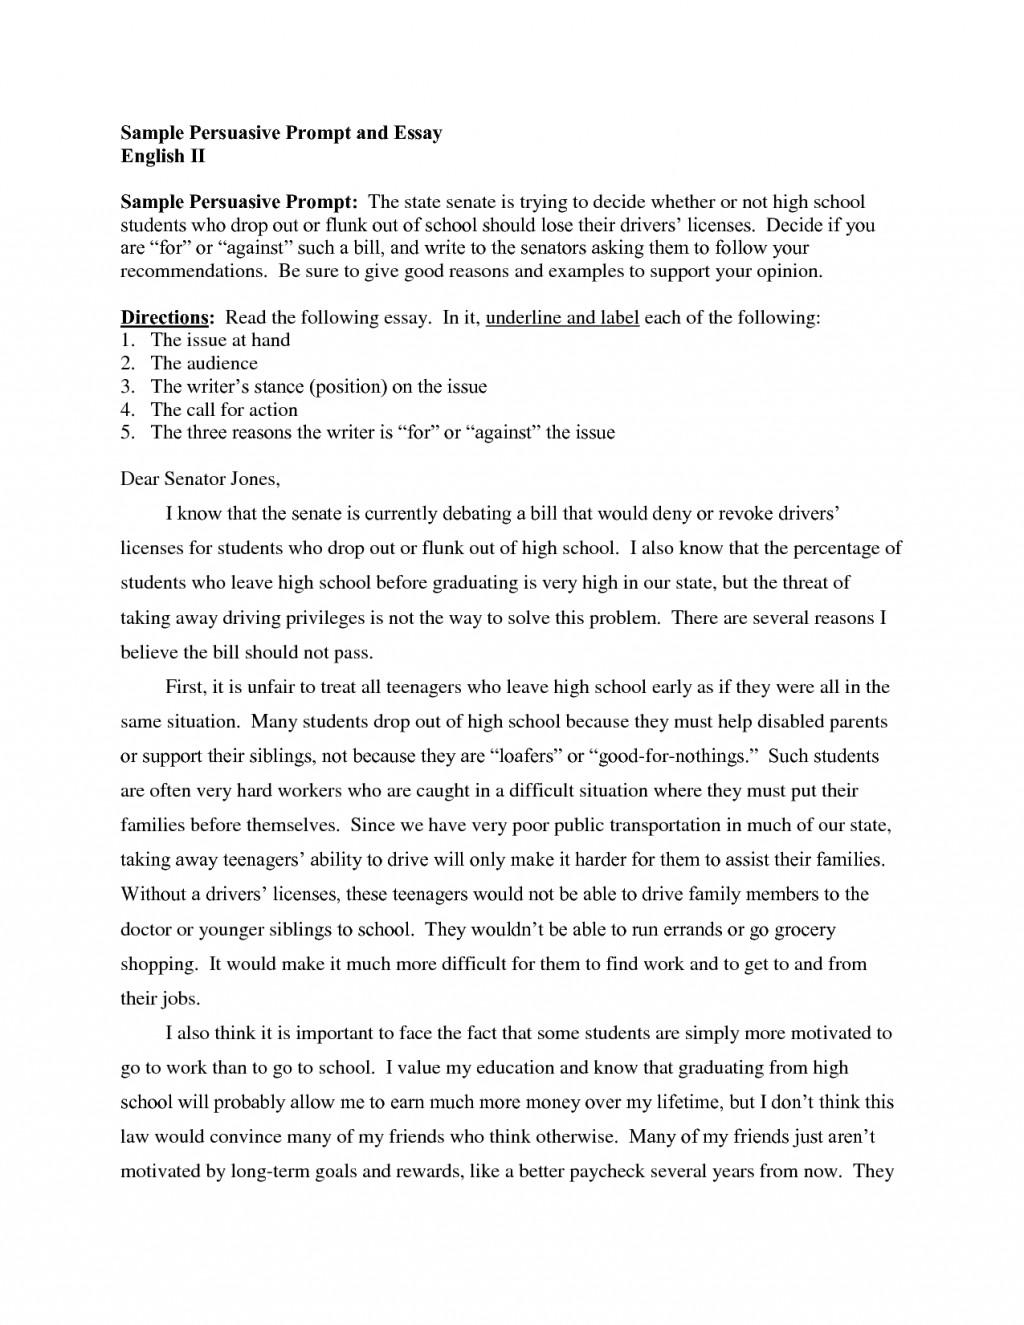 National peace essay 2009